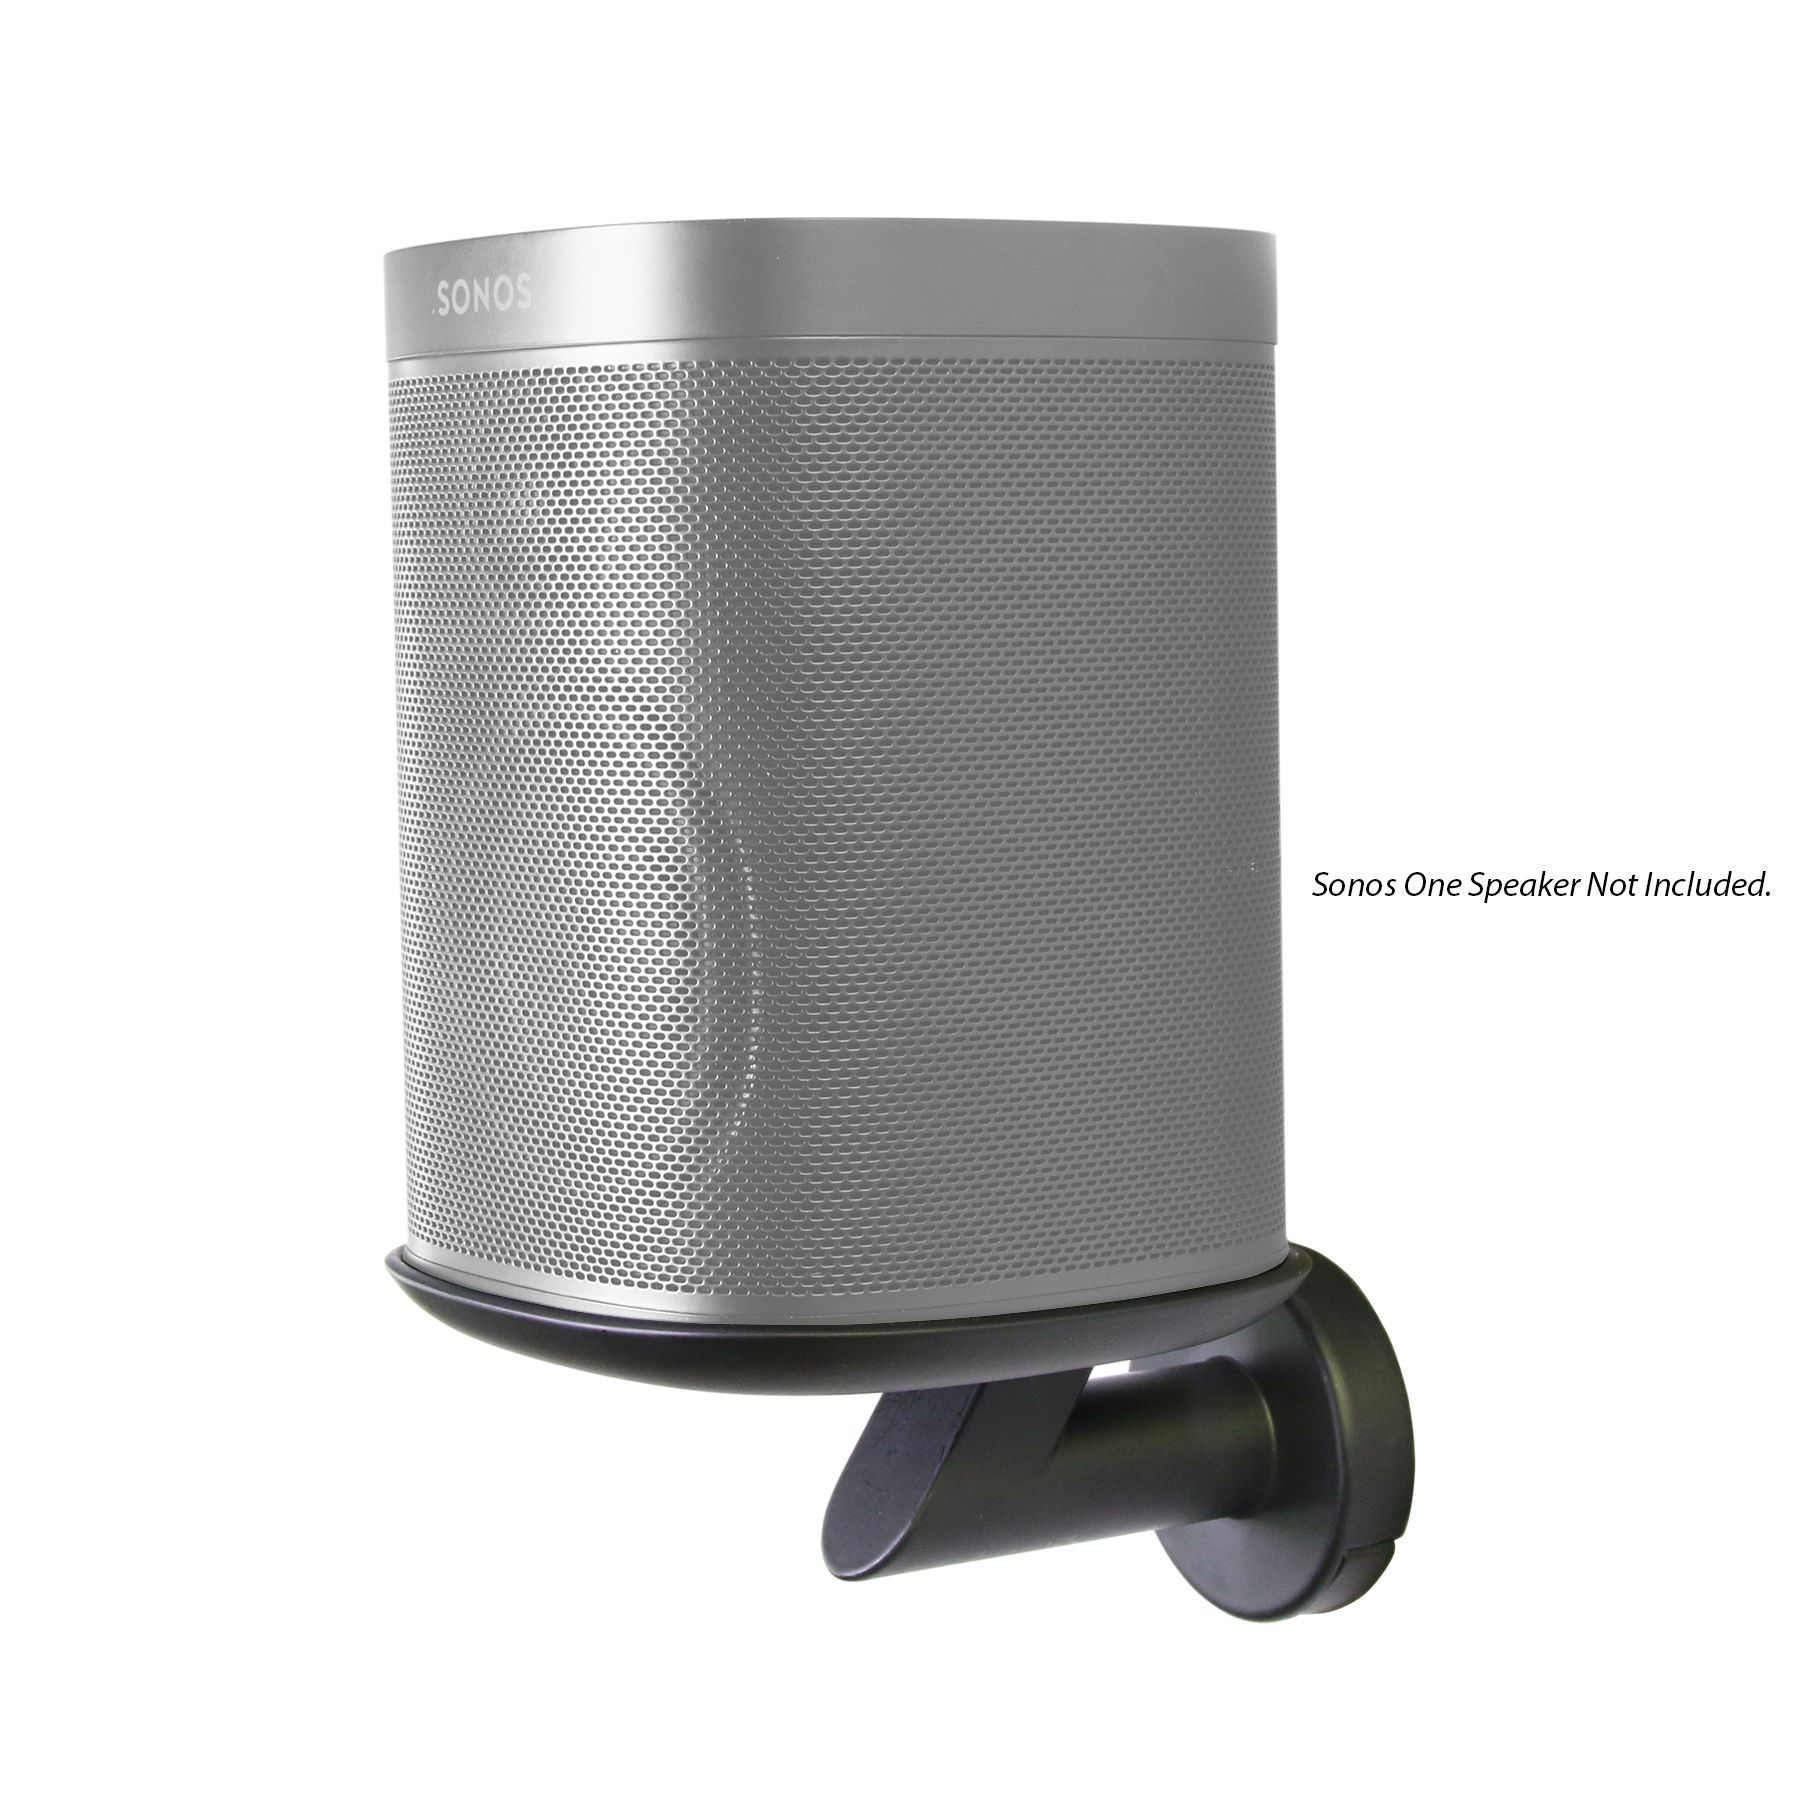 Speaker Wall Bracket/Mount S-ONE-SB for SONOS ONE (Single)